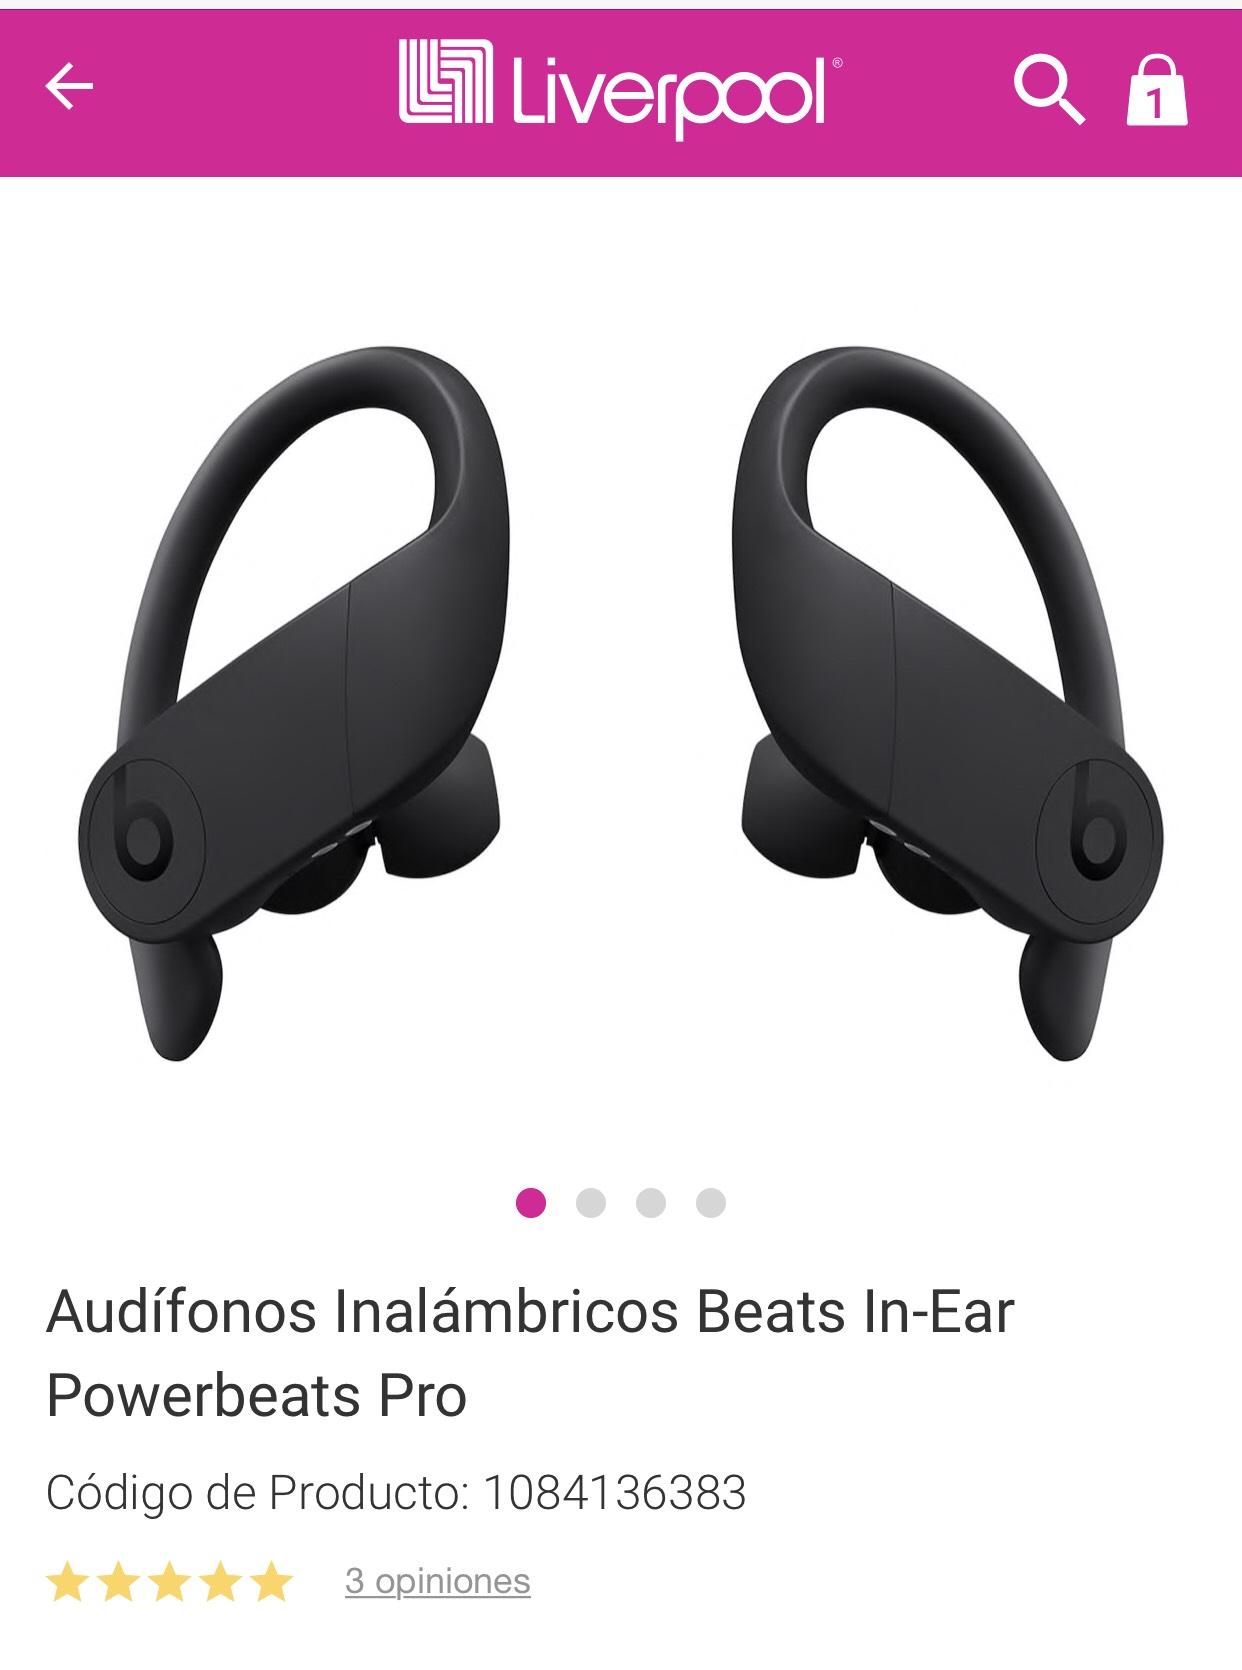 liverpool Audífonos inalámbricos Powerbeats Pro